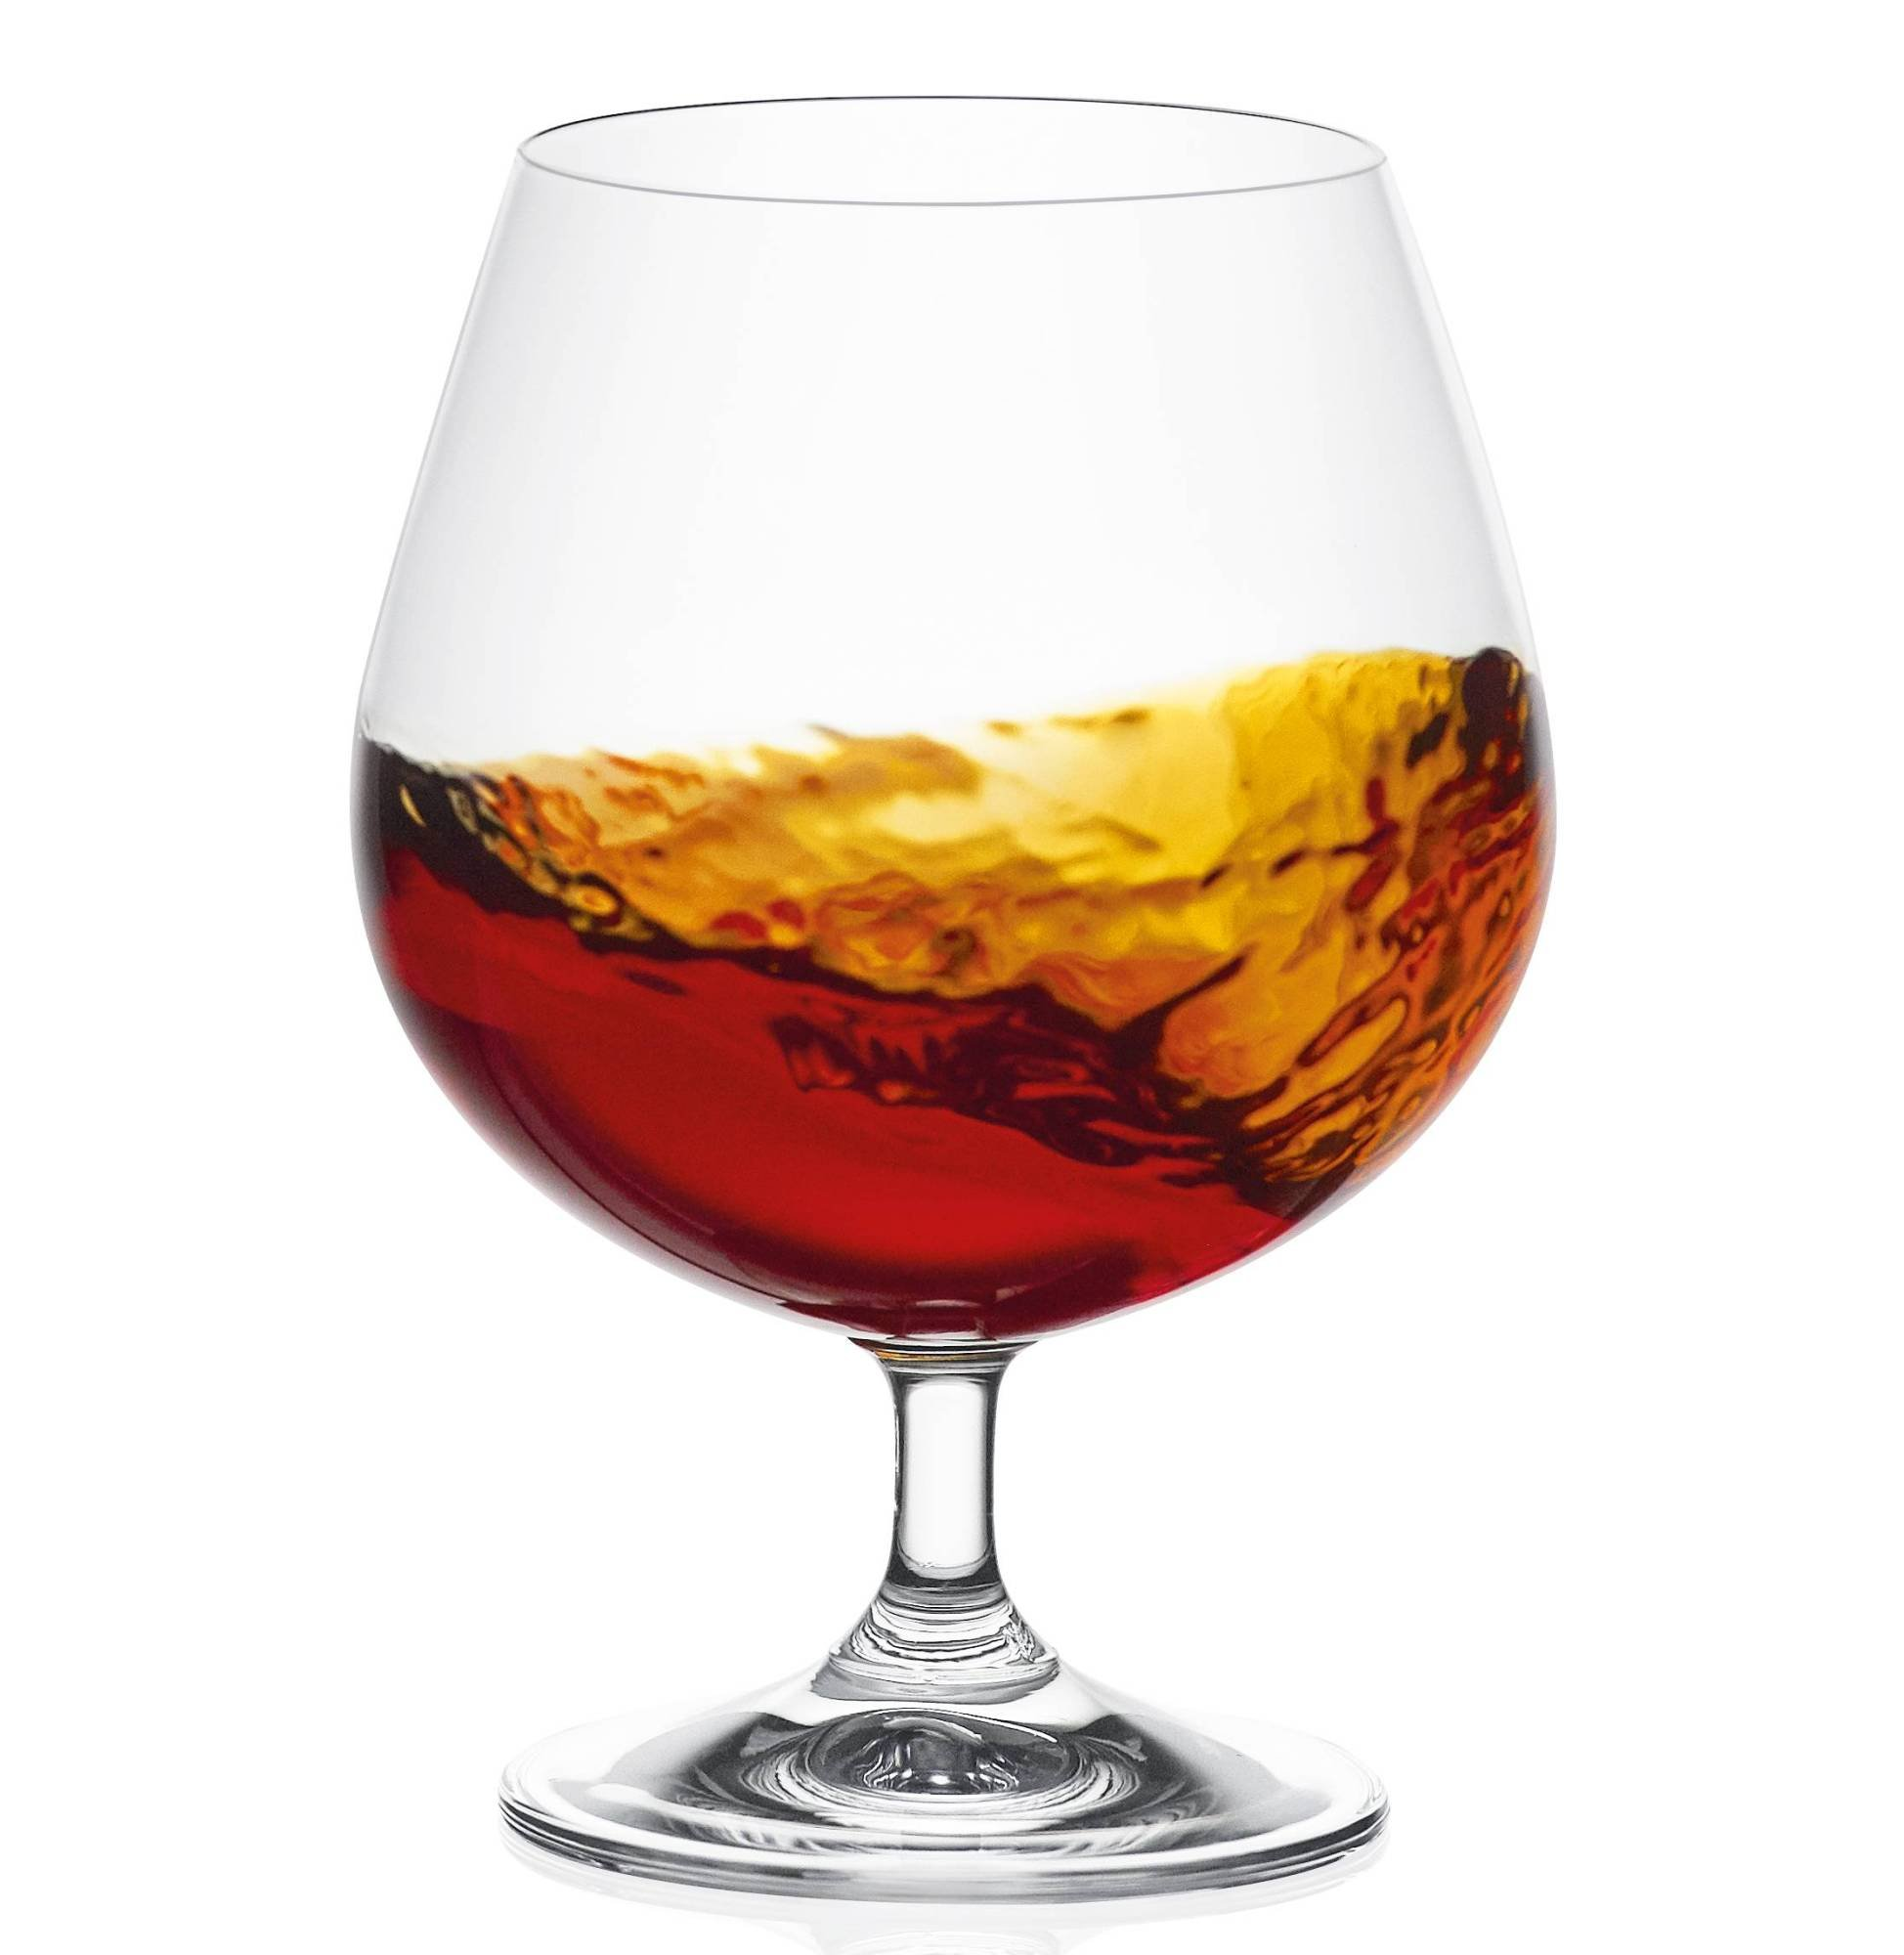 RONA Gala Brandy Glass, 14 oz, Set of 6 by RONA